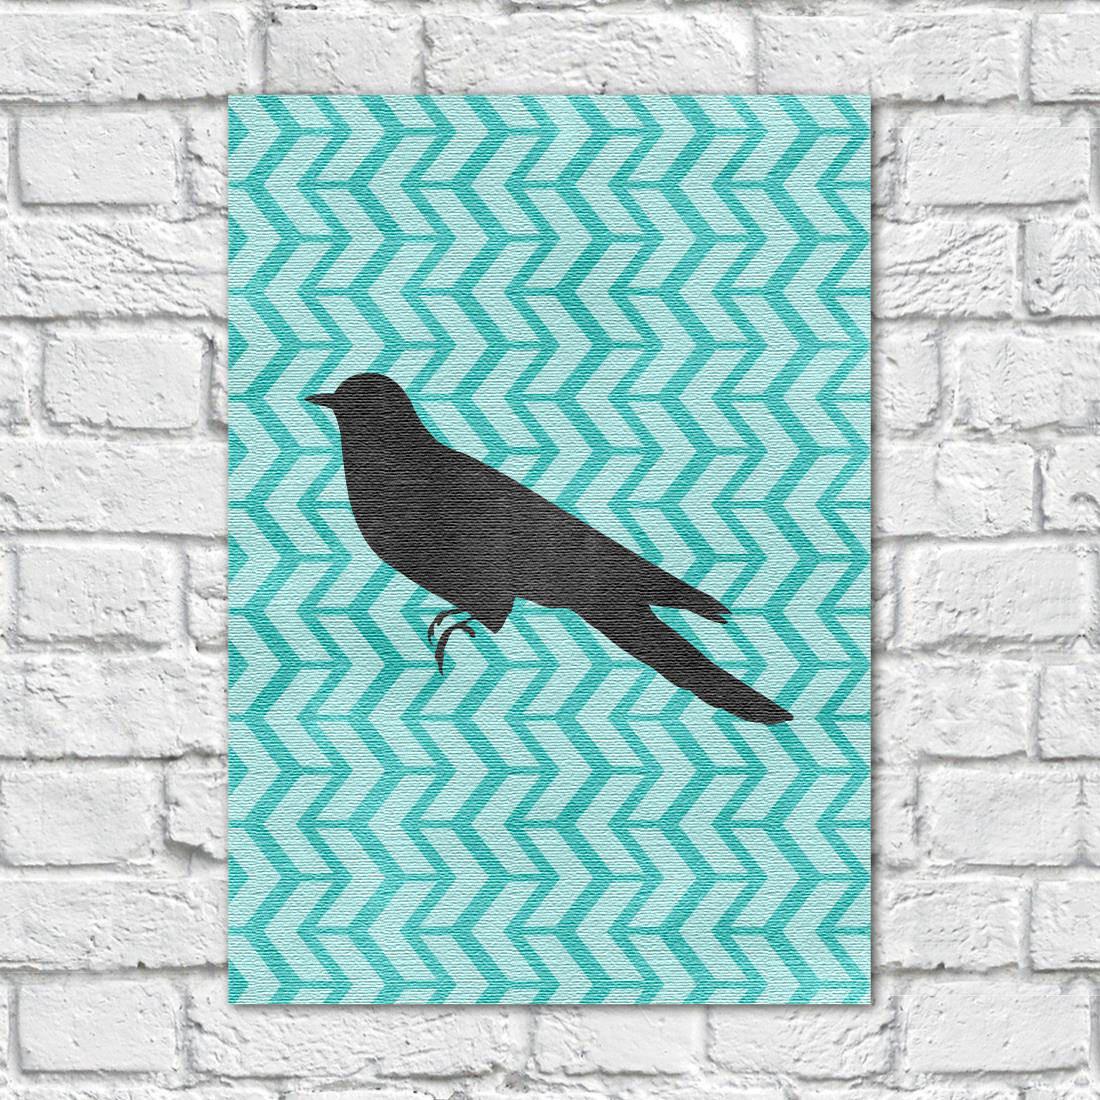 Quadro Decorativo Pássaro Fundo Abstrato Azul